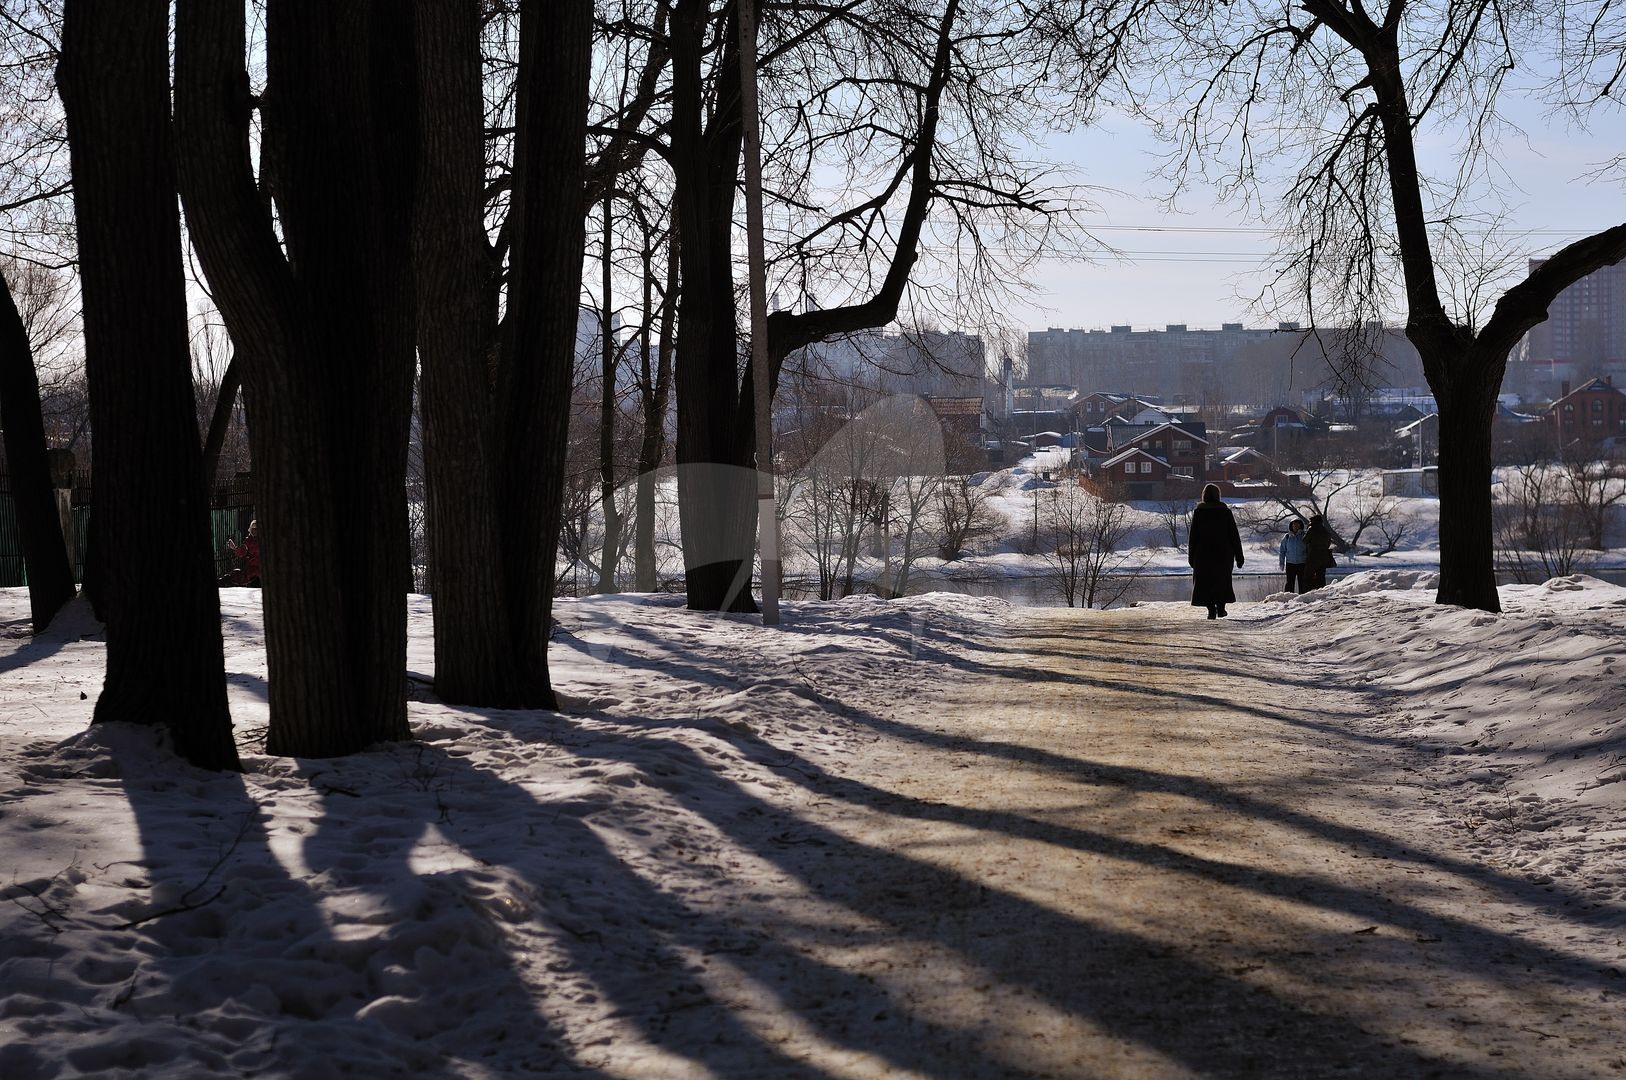 Парк с прудами, XVIII в., усадьба «Кривякино»